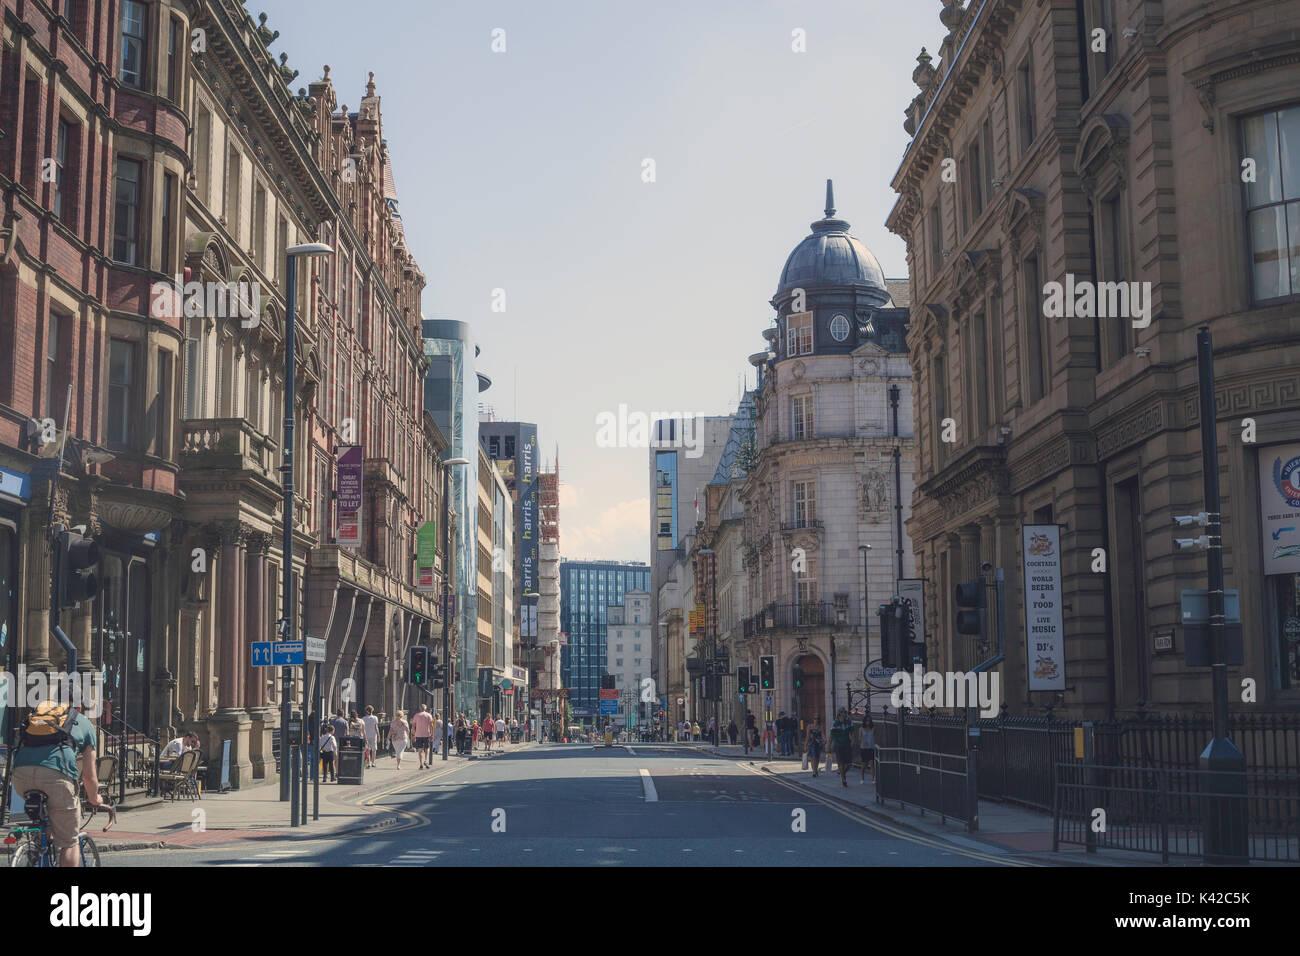 Leeds City Centre - Architecture - Stock Image